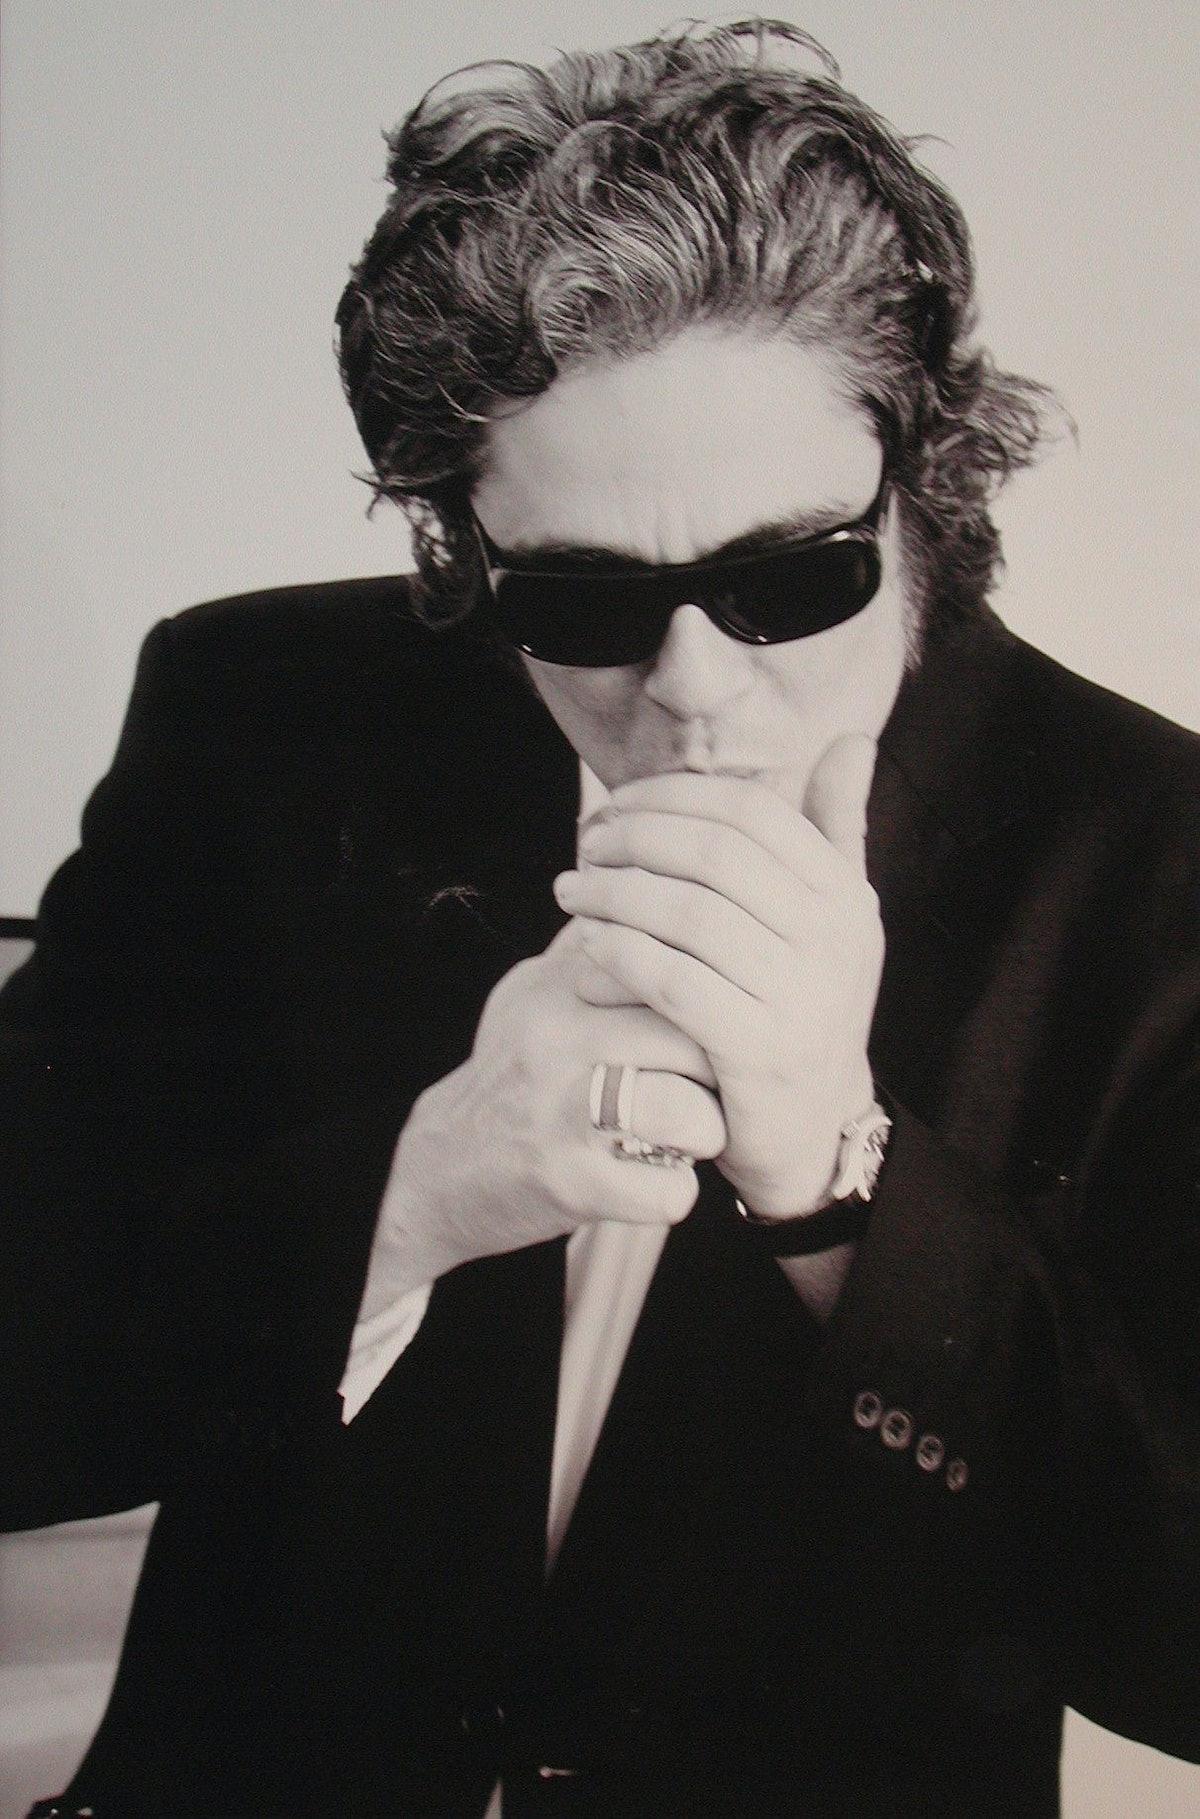 BeniciodelToro(HollywoodStars)2002.jpg